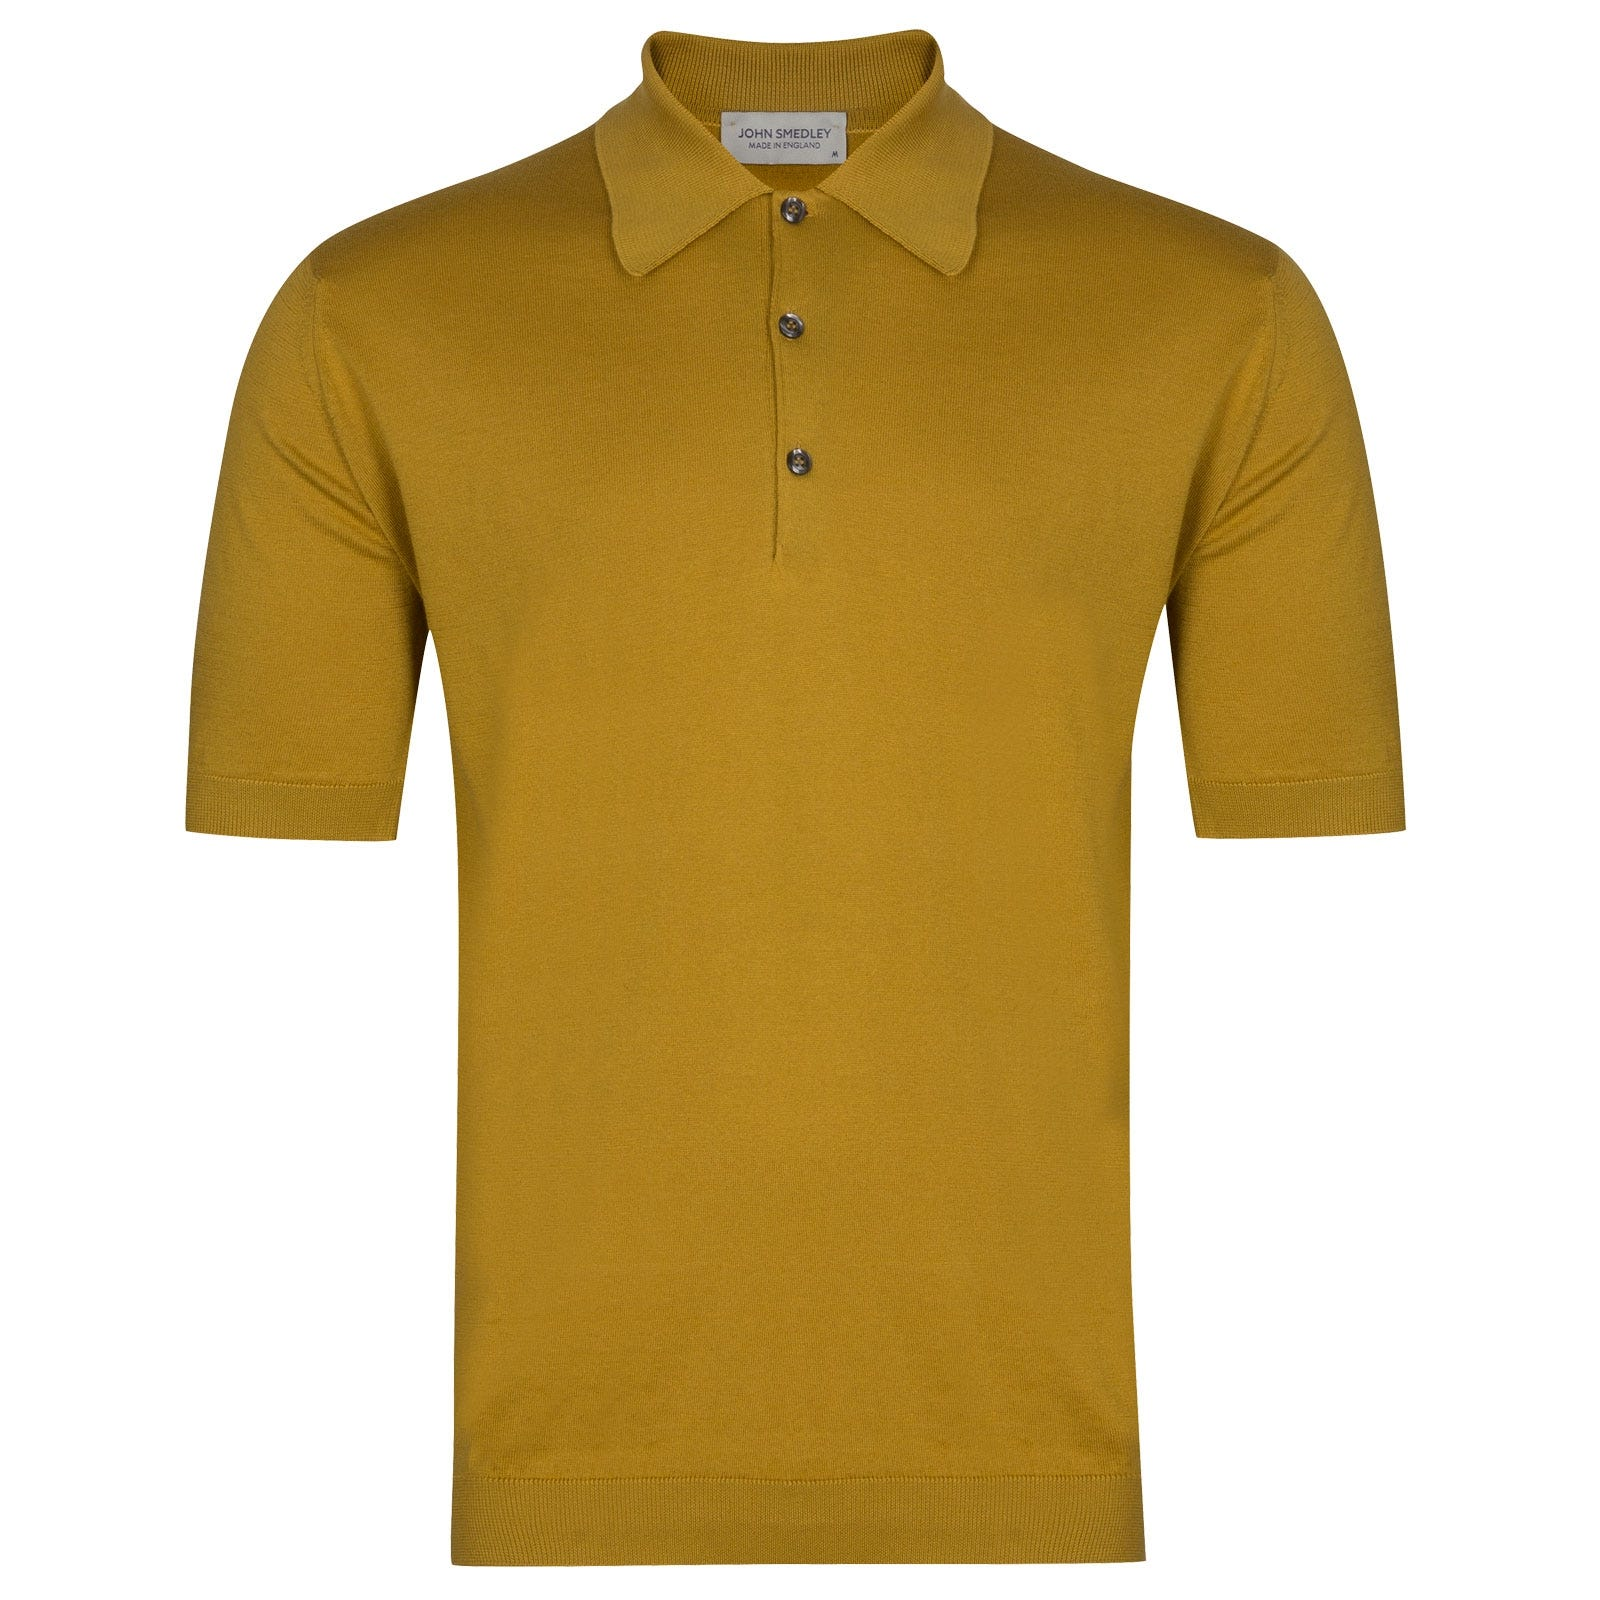 John Smedley Isis in Stamen Yellow Shirt-XSM